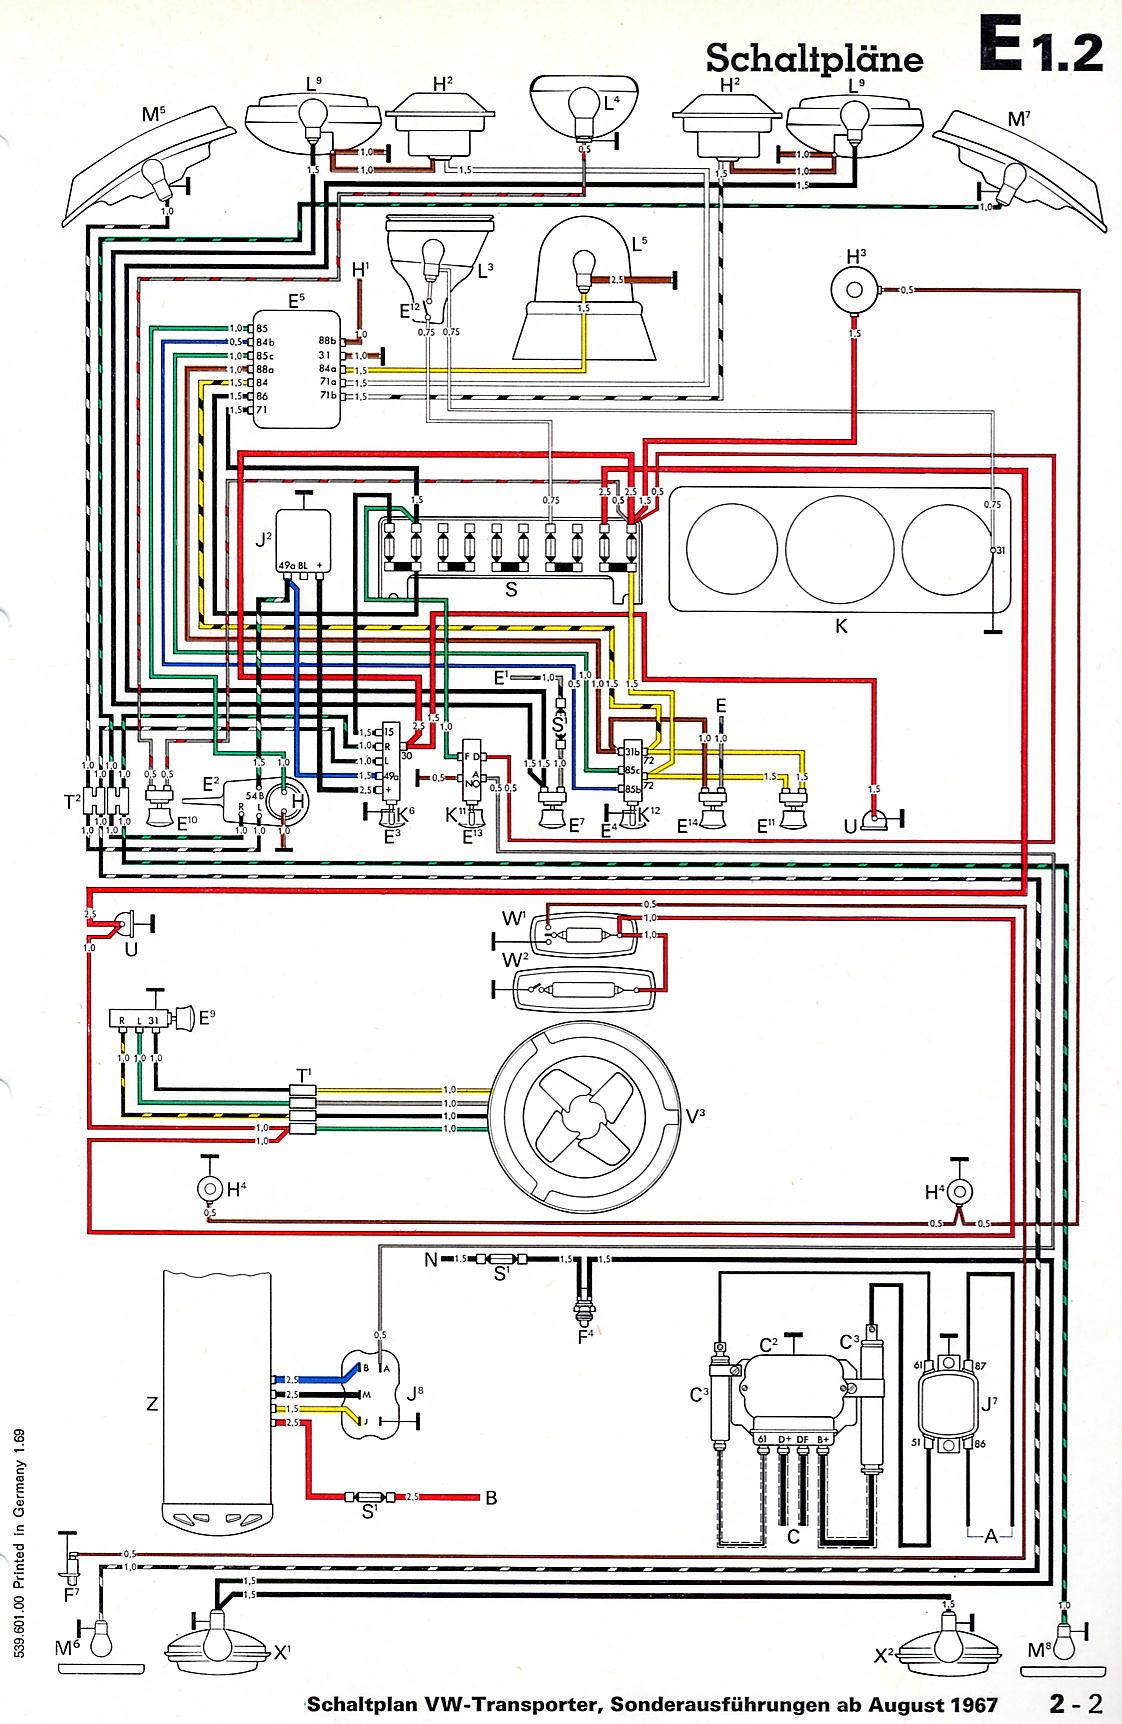 C41bbb 1968 69 Bus Wiring Diagram Thegoldenbug Wiring Library